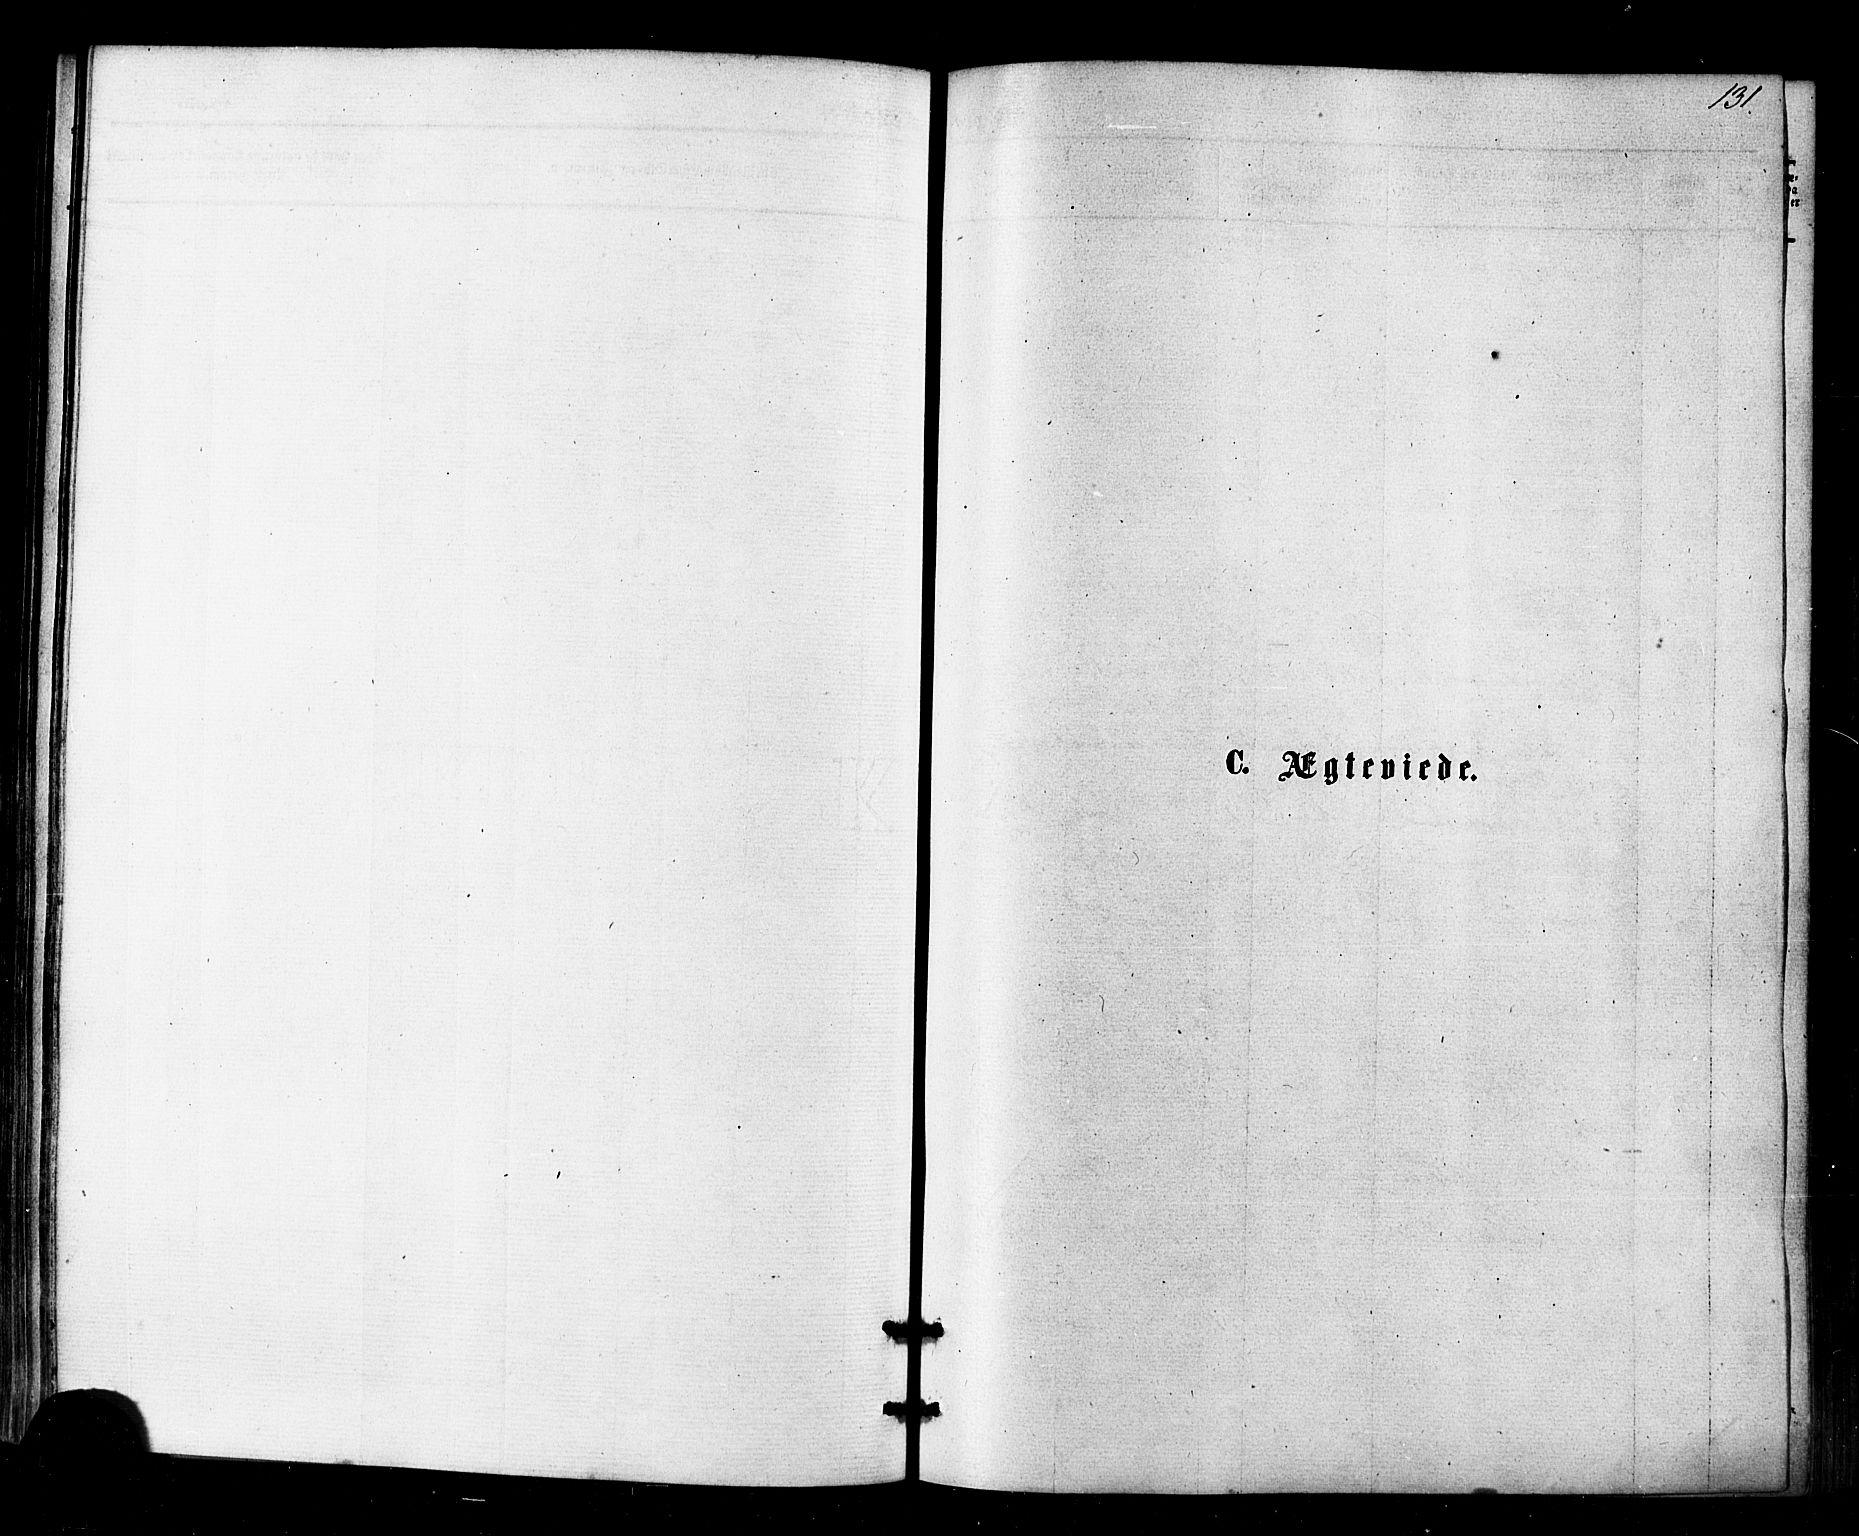 SATØ, Kistrand/Porsanger sokneprestembete, Ministerialbok nr. 6, 1875-1880, s. 131